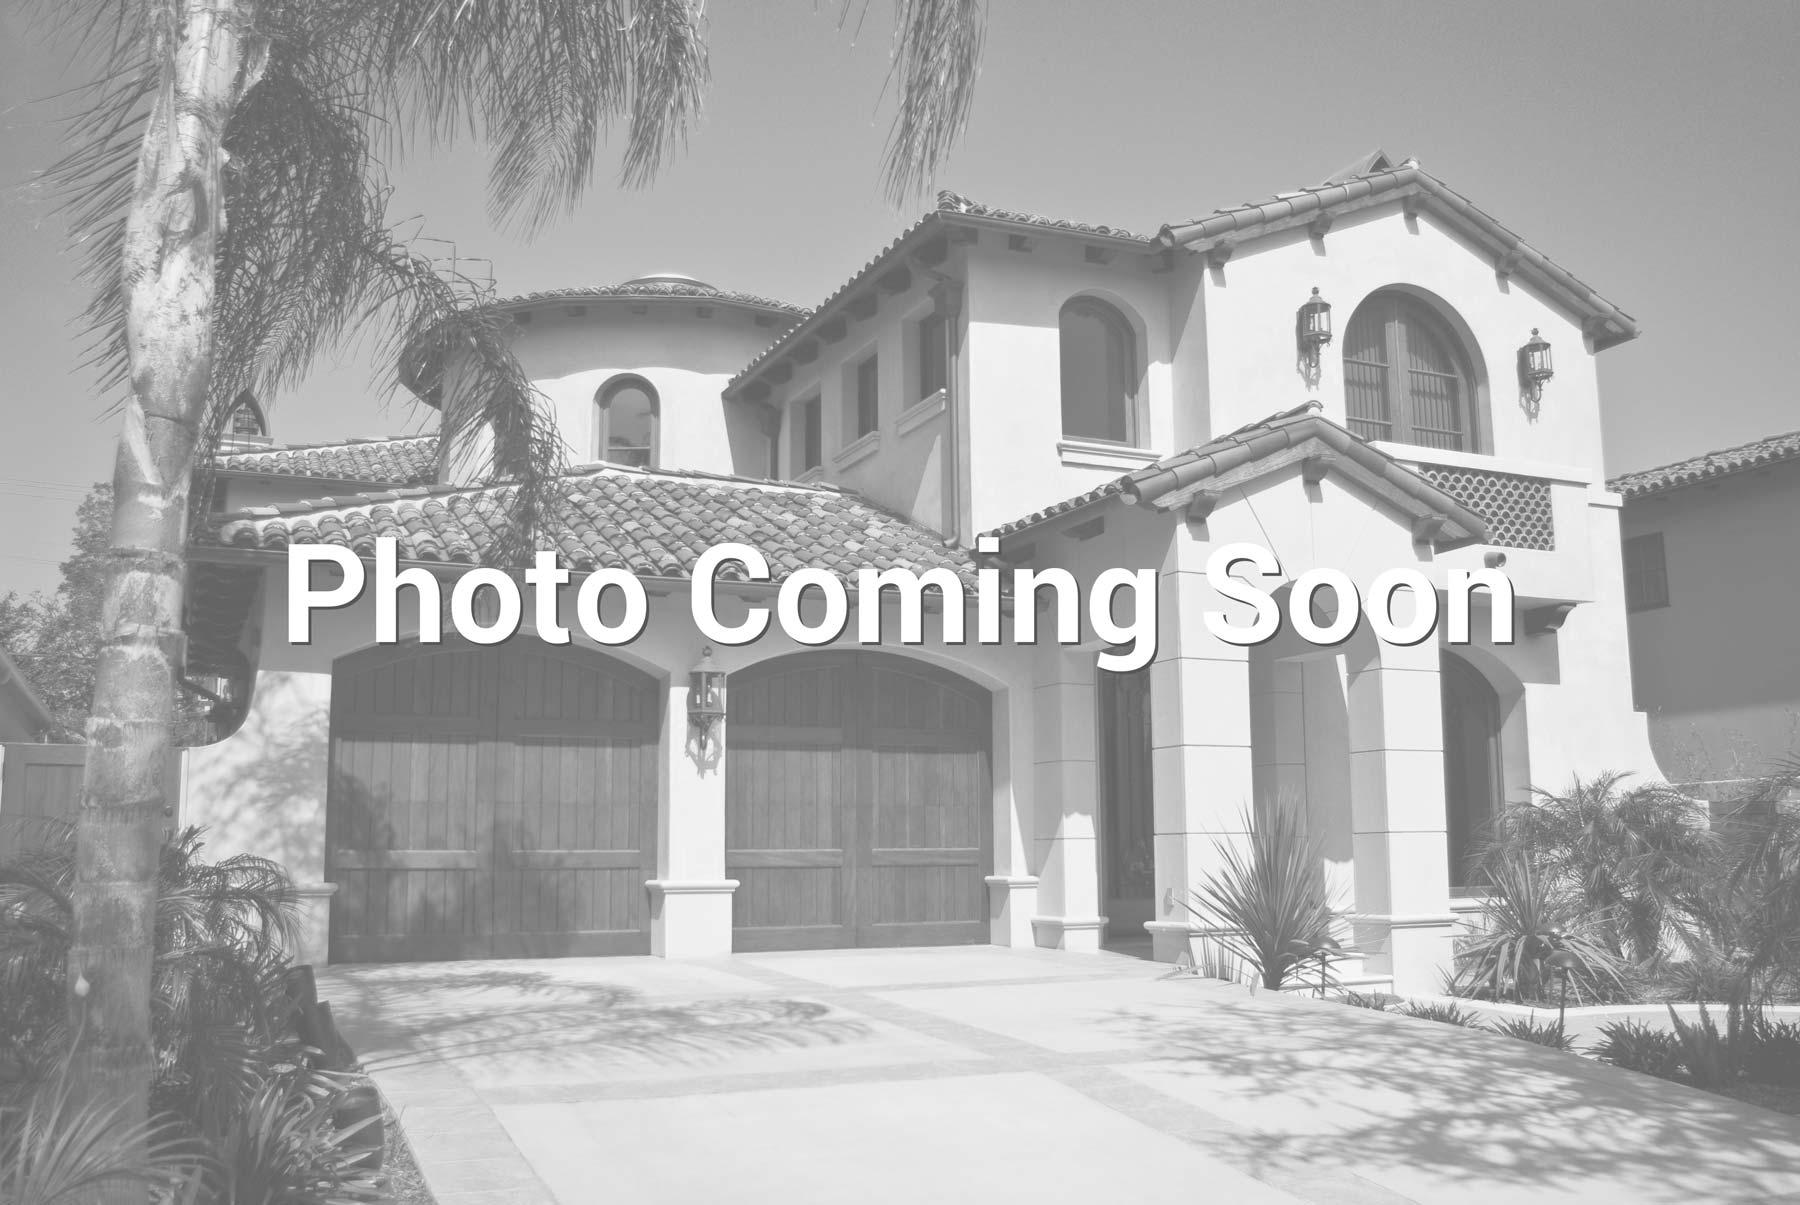 $480,000 - 2Br/2Ba -  for Sale in Optima Camelview Village Condominium Amd, Scottsdale